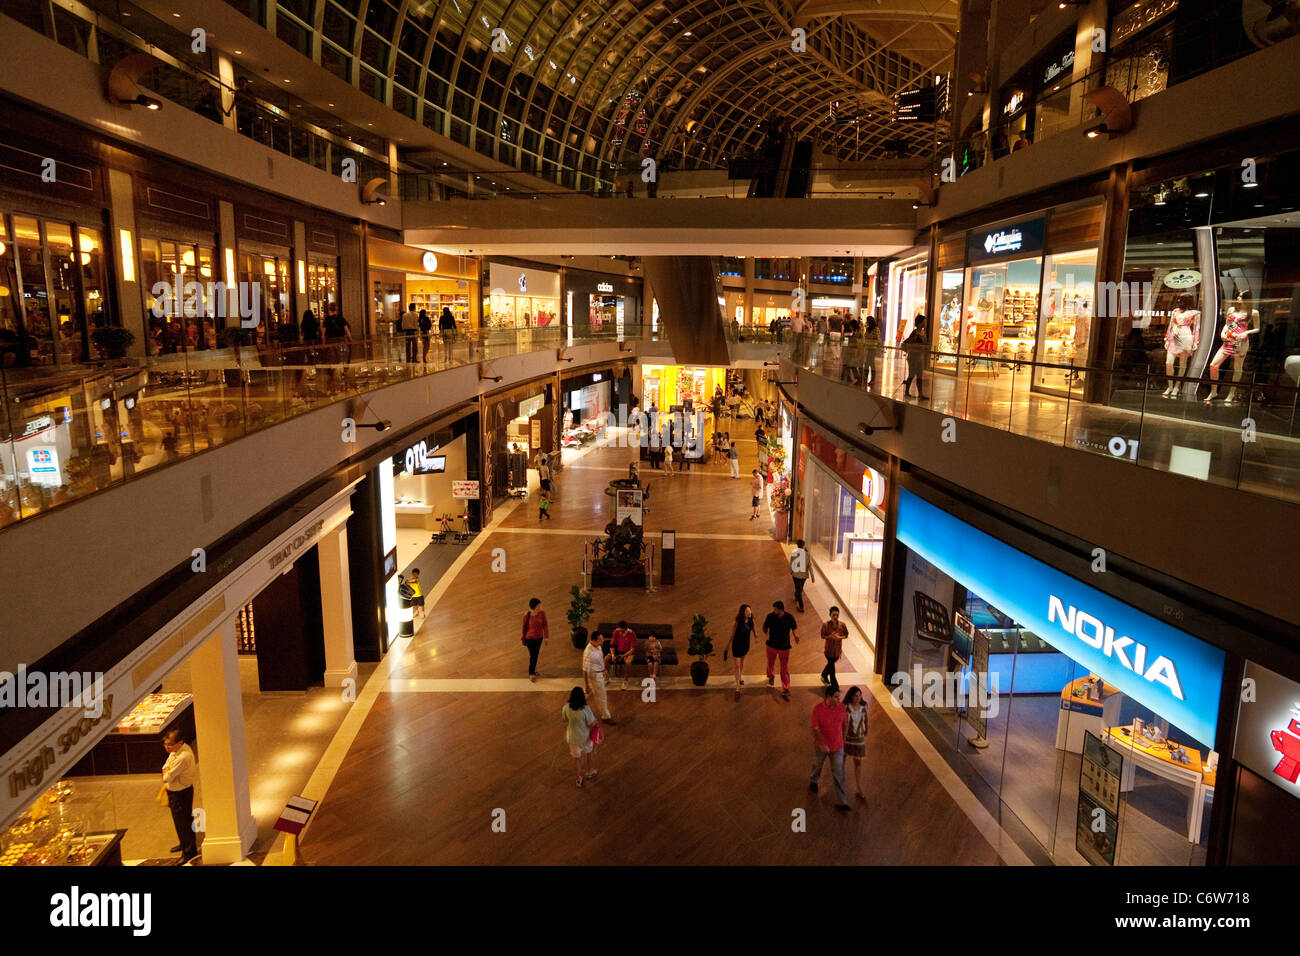 The Marina Bay Sands Hotel shopping mall, Singapore asia - Stock Image